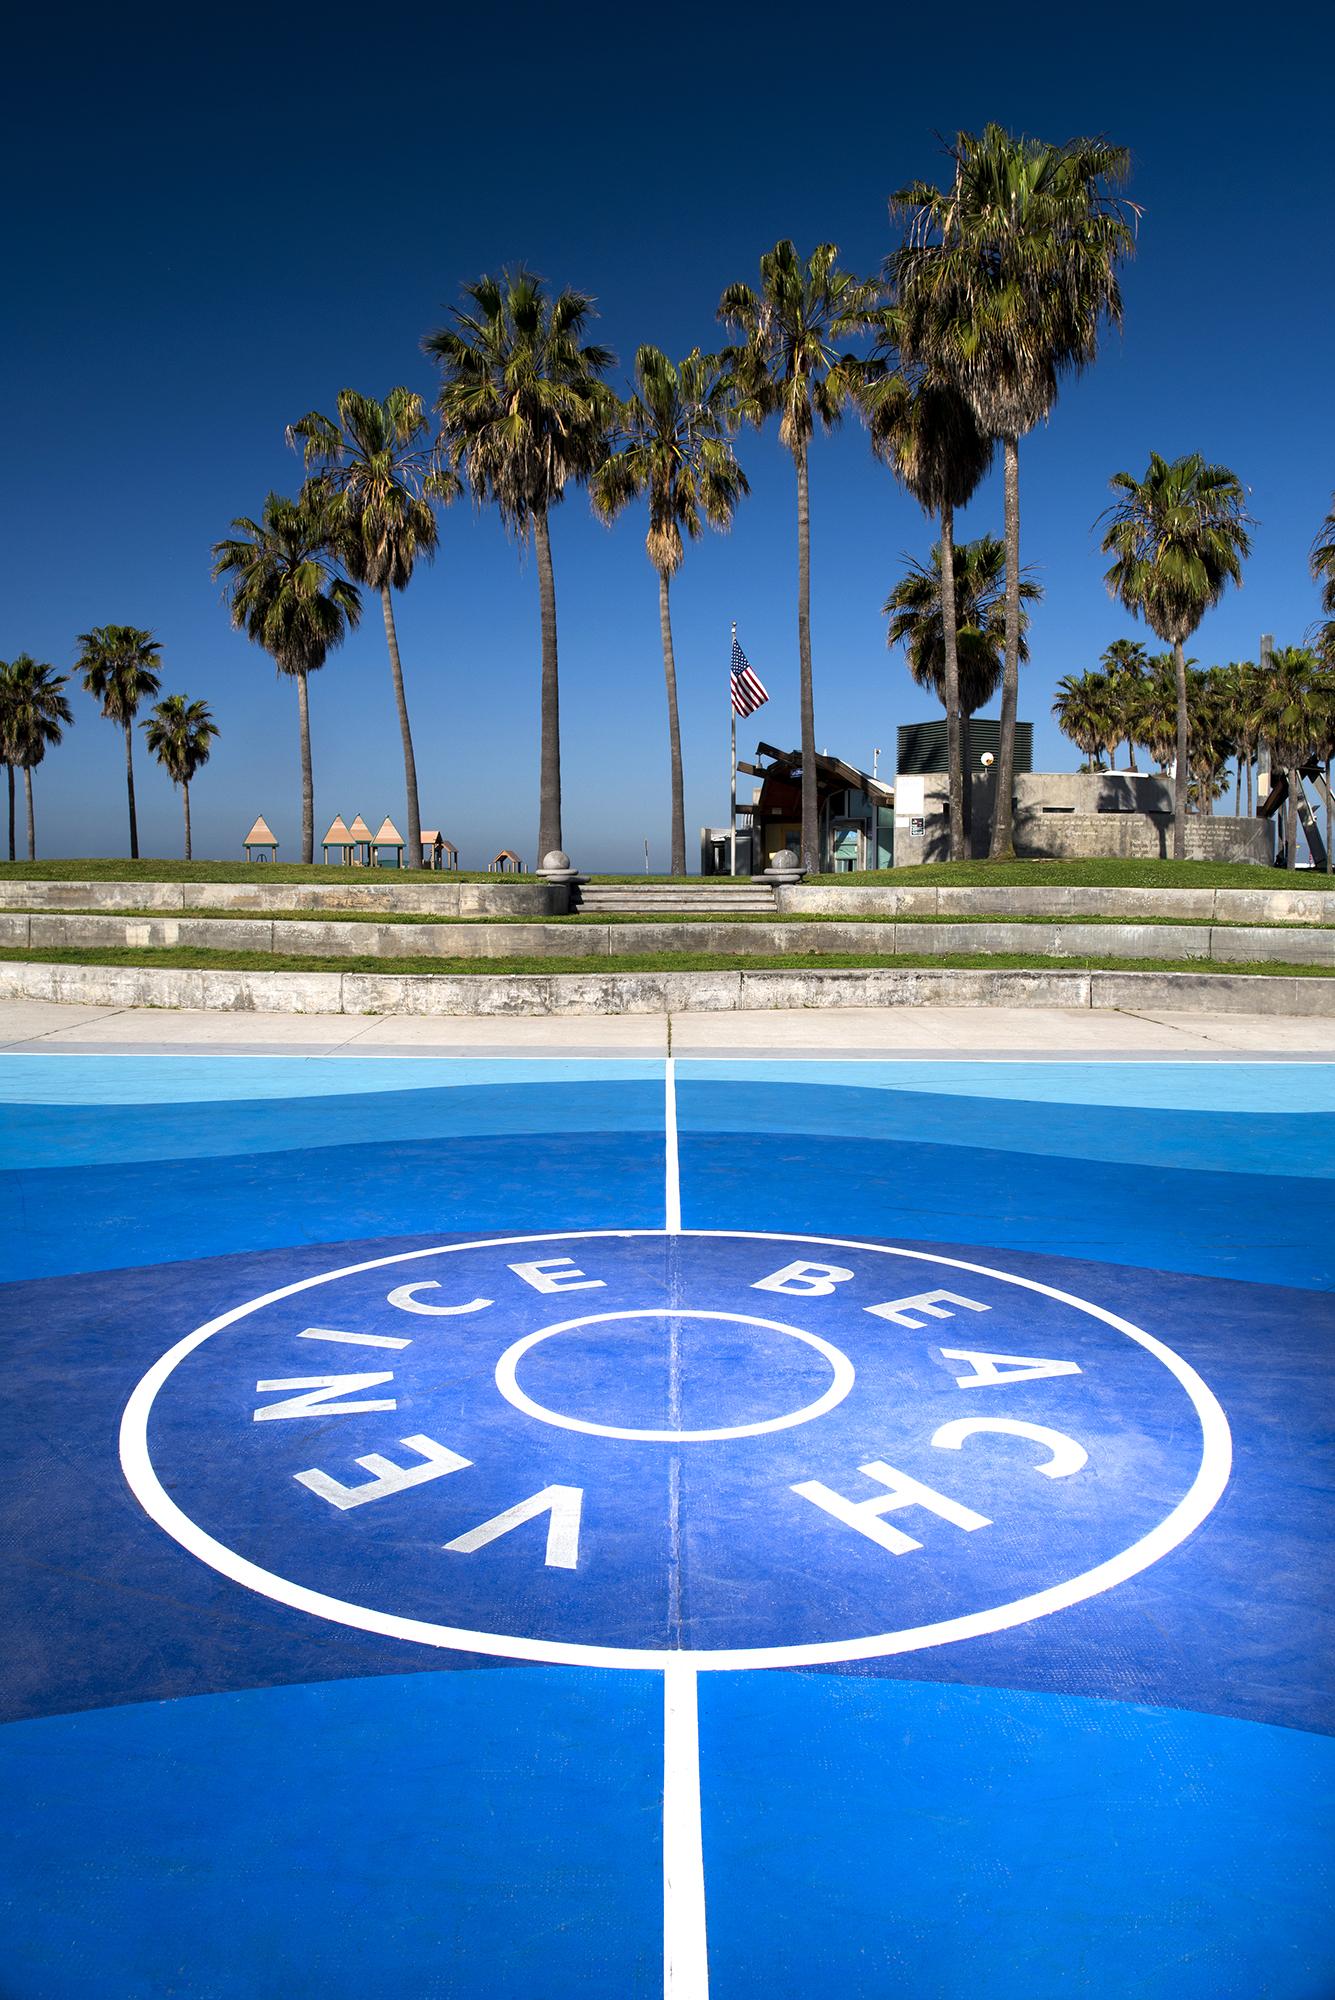 Venice Beach - VBL